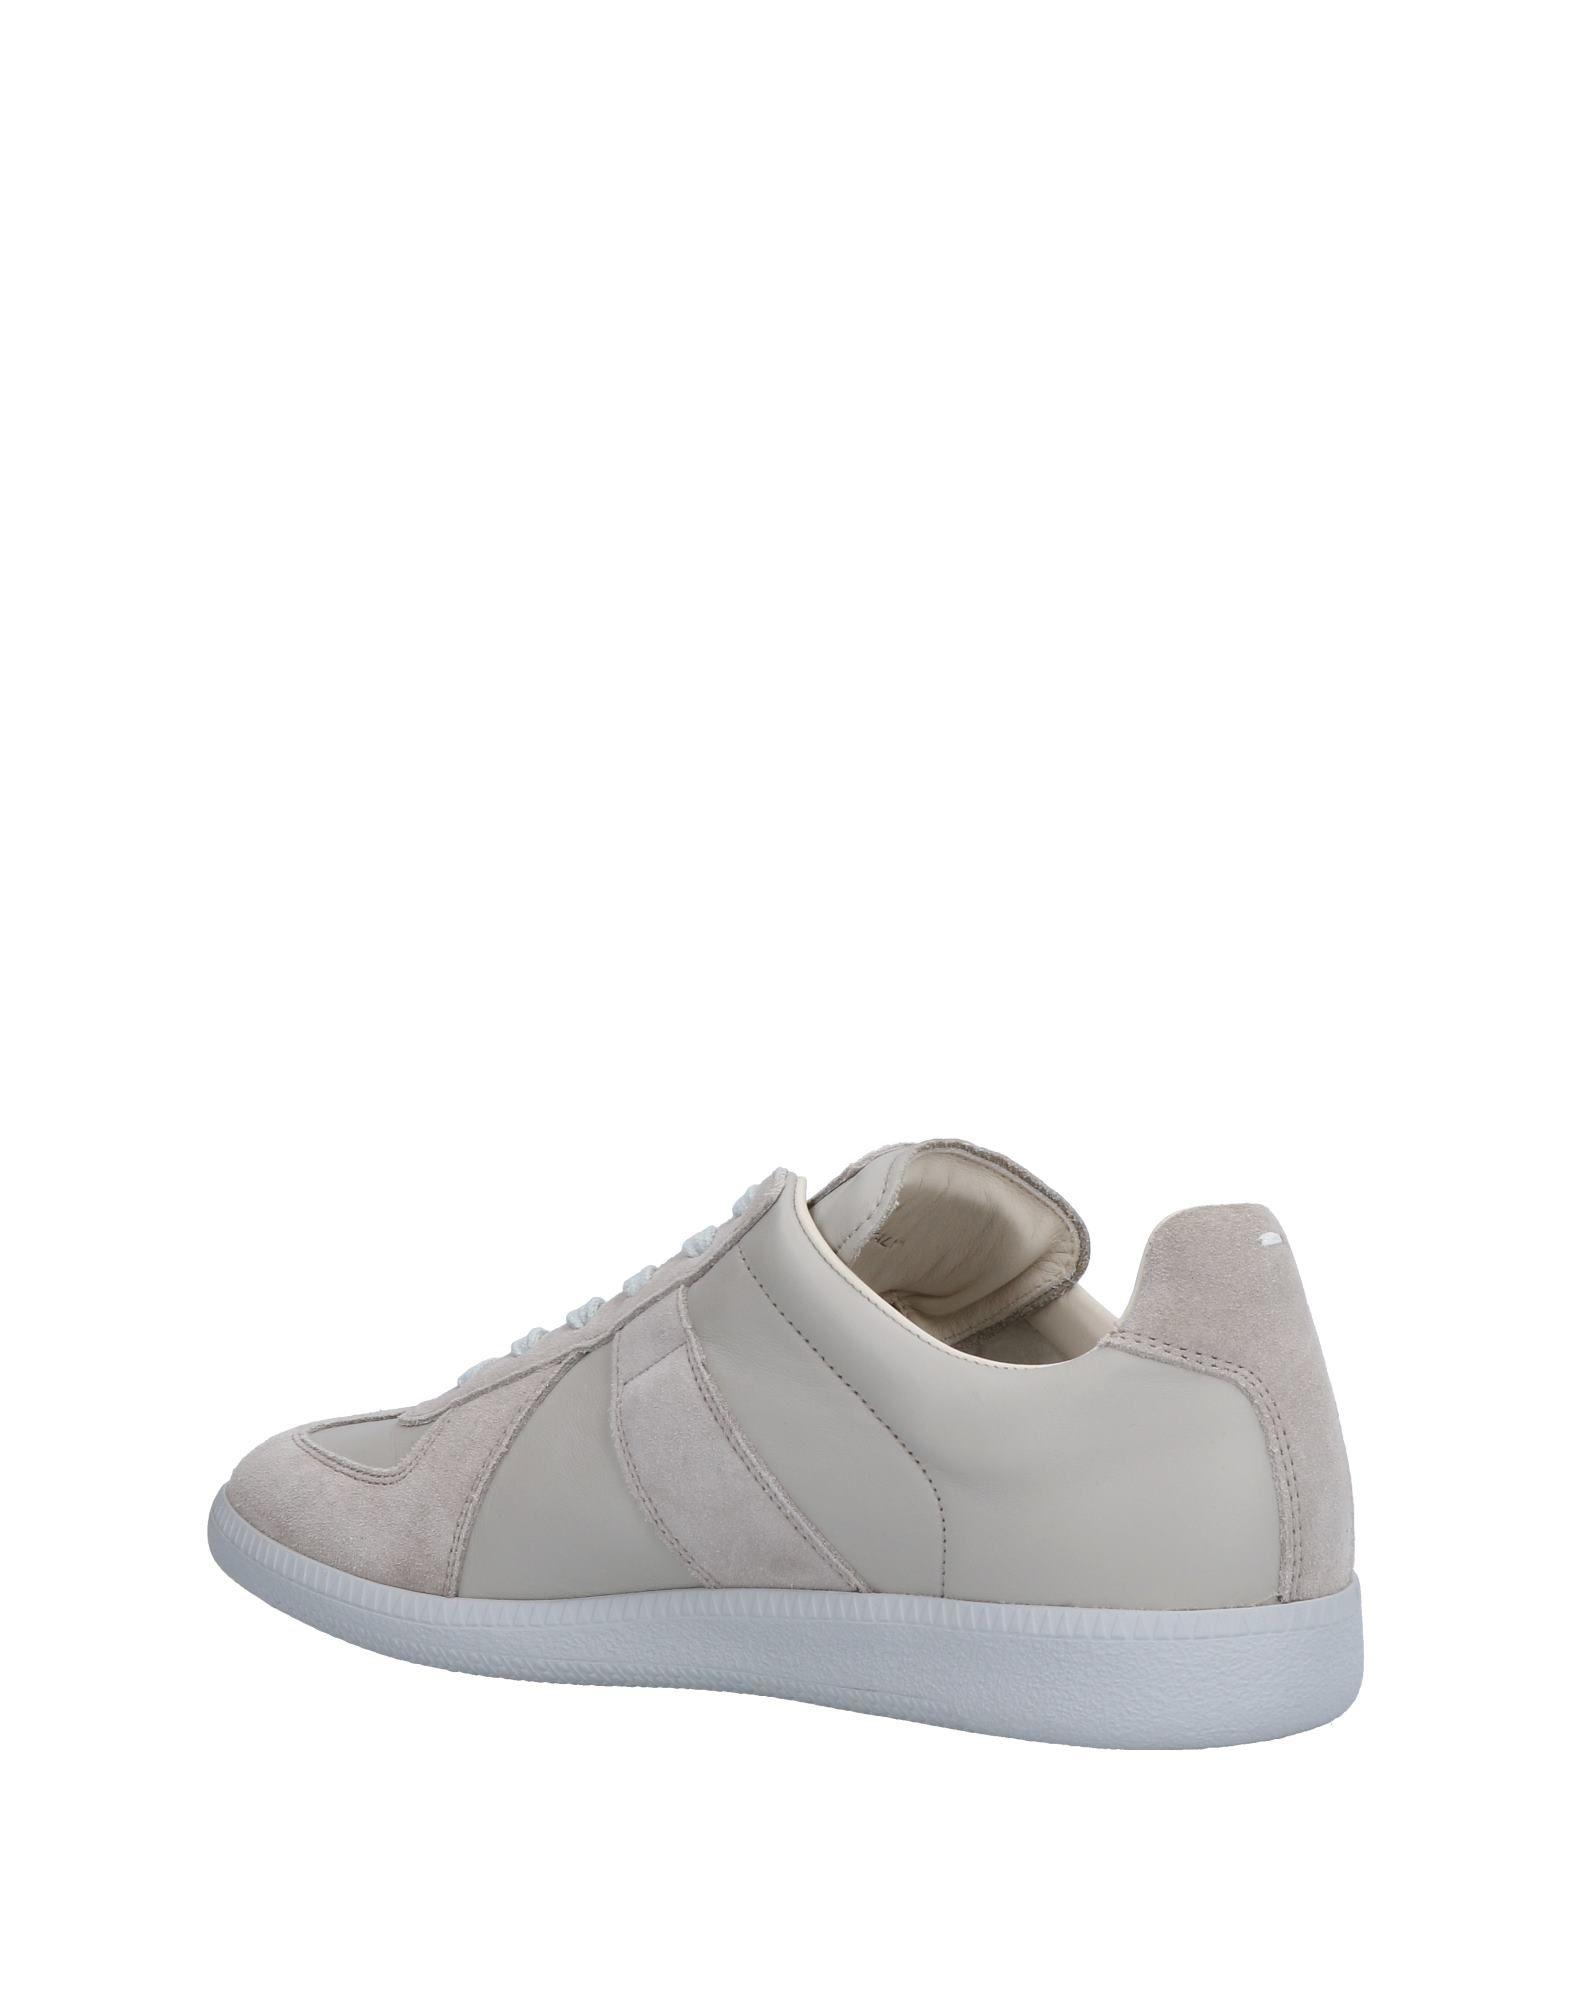 Maison Margiela Sneakers Herren  11472164SK Gute Qualität beliebte Schuhe